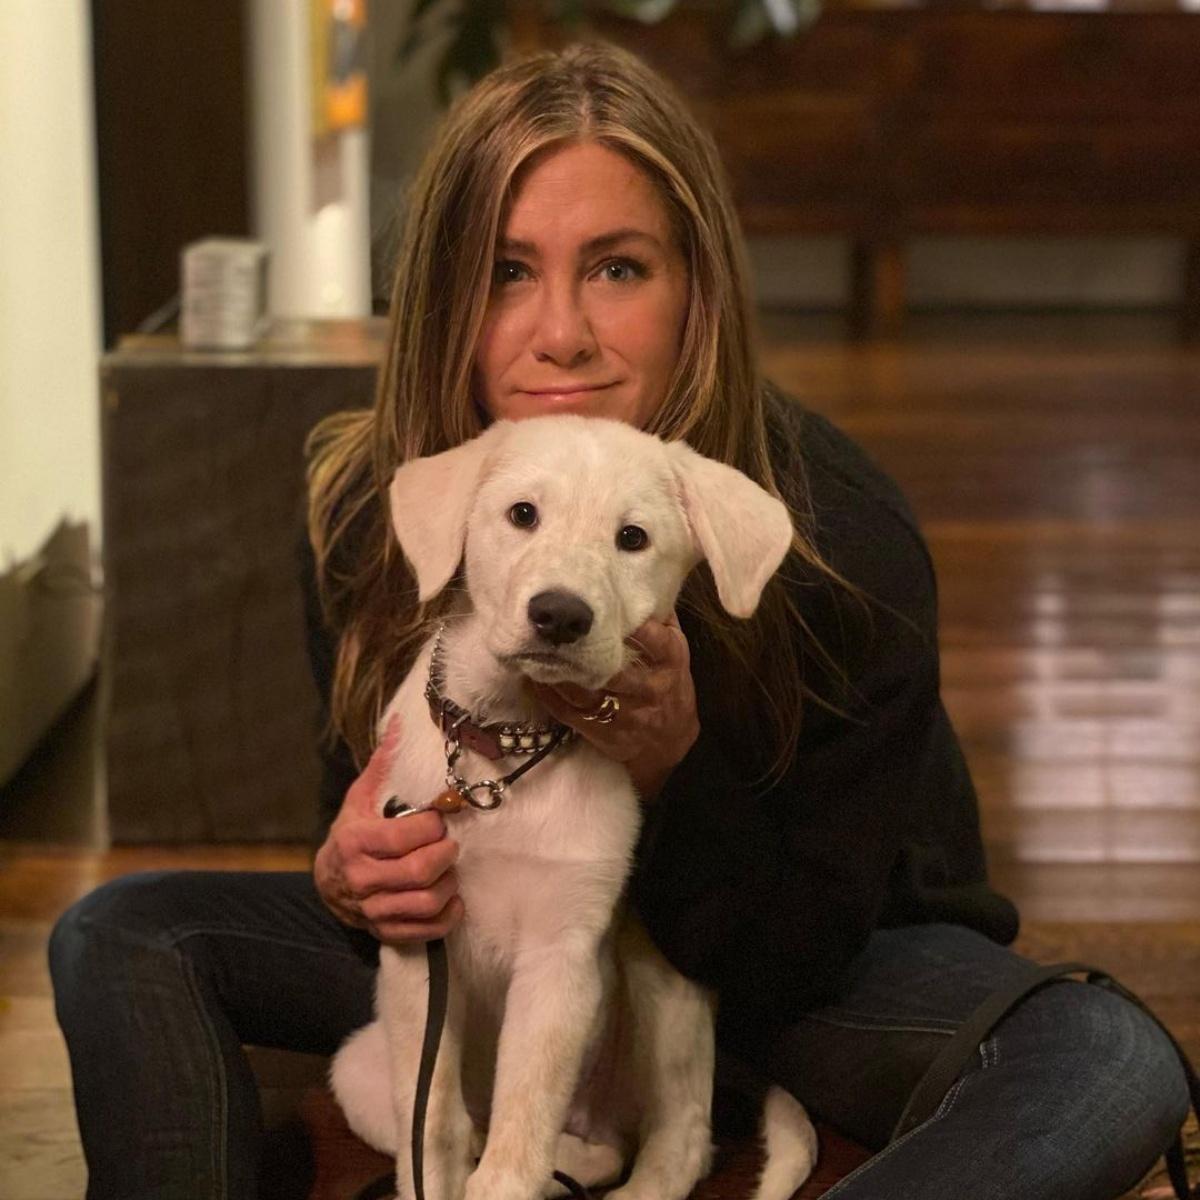 Jennifer Aniston, Kerry Washington and More Stars Celebrate Thanksgiving 2020